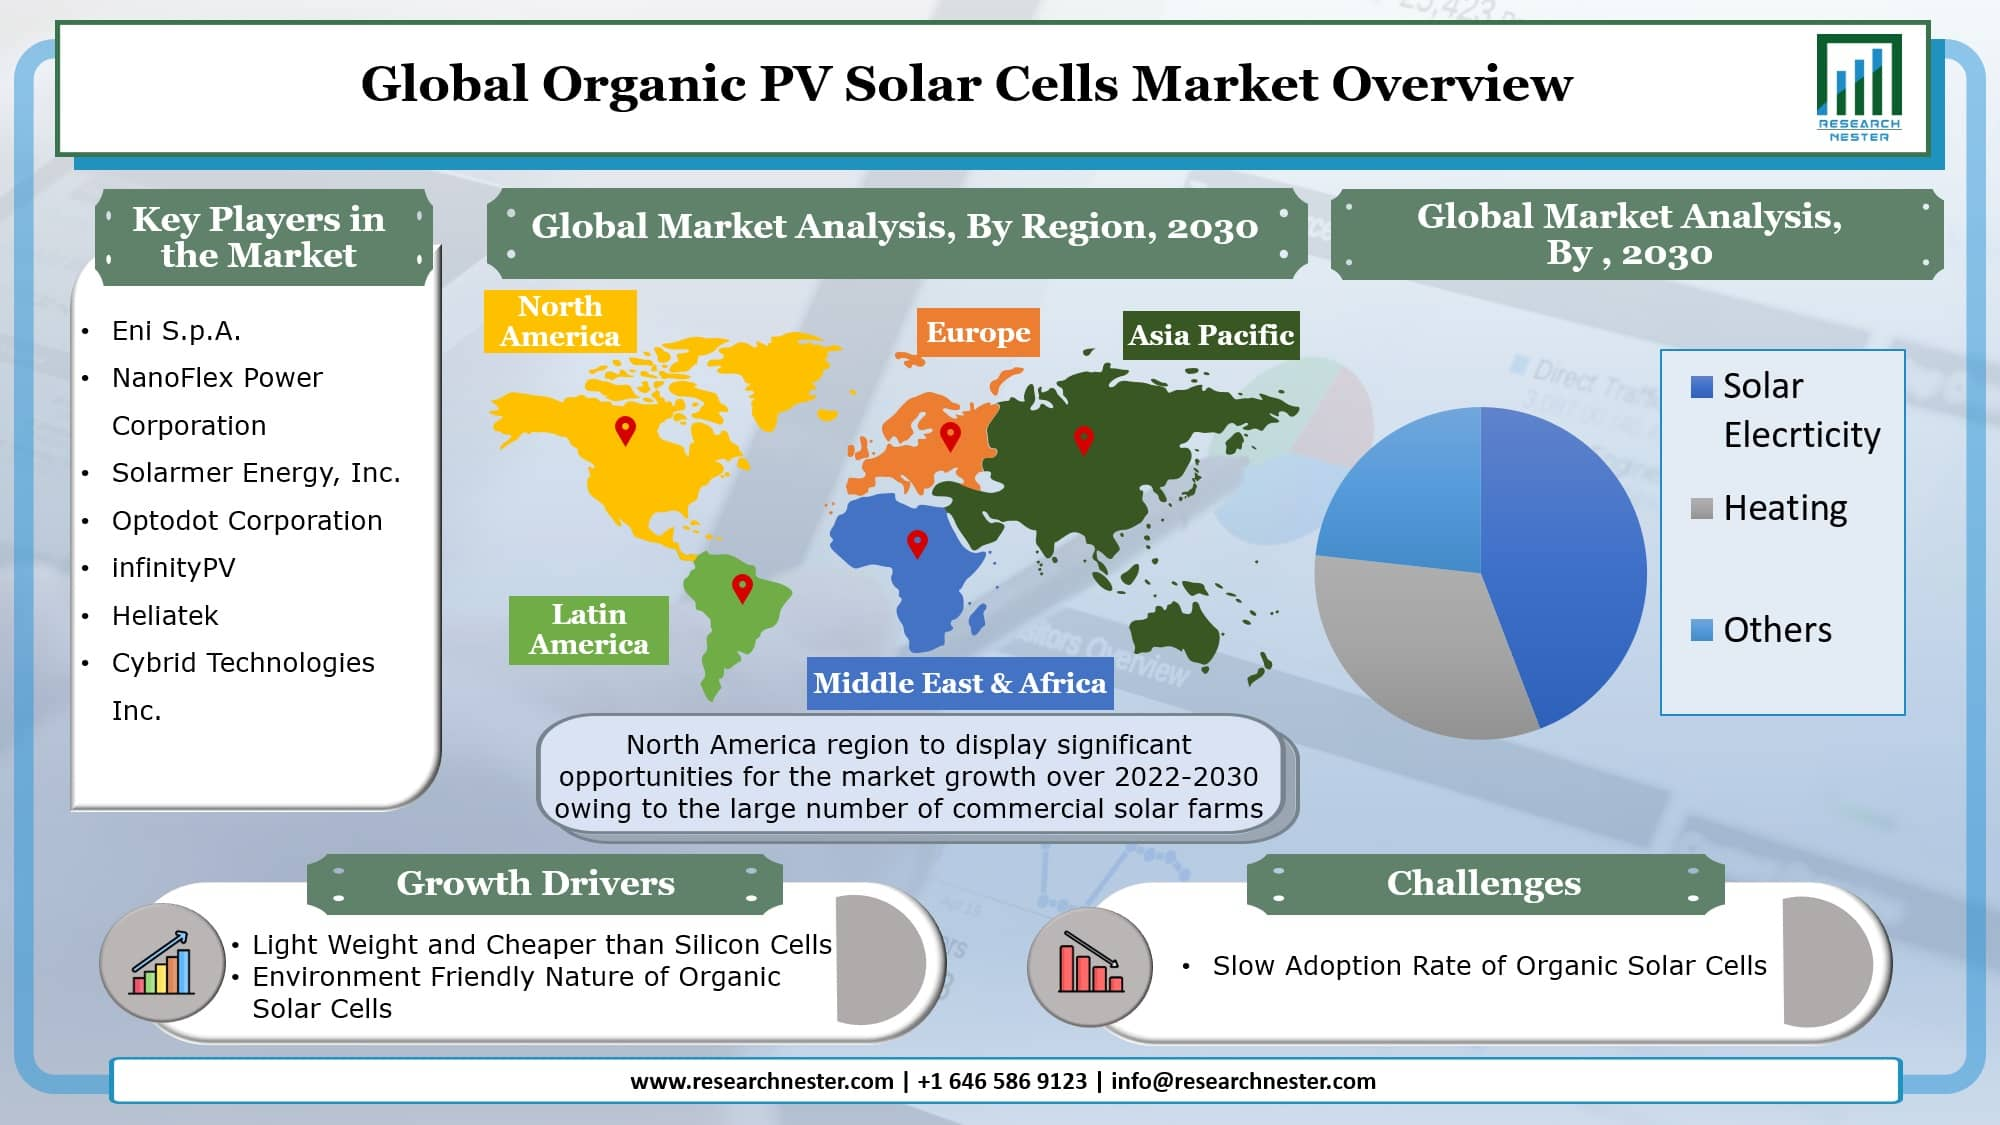 Organic PV Solar Cells Market